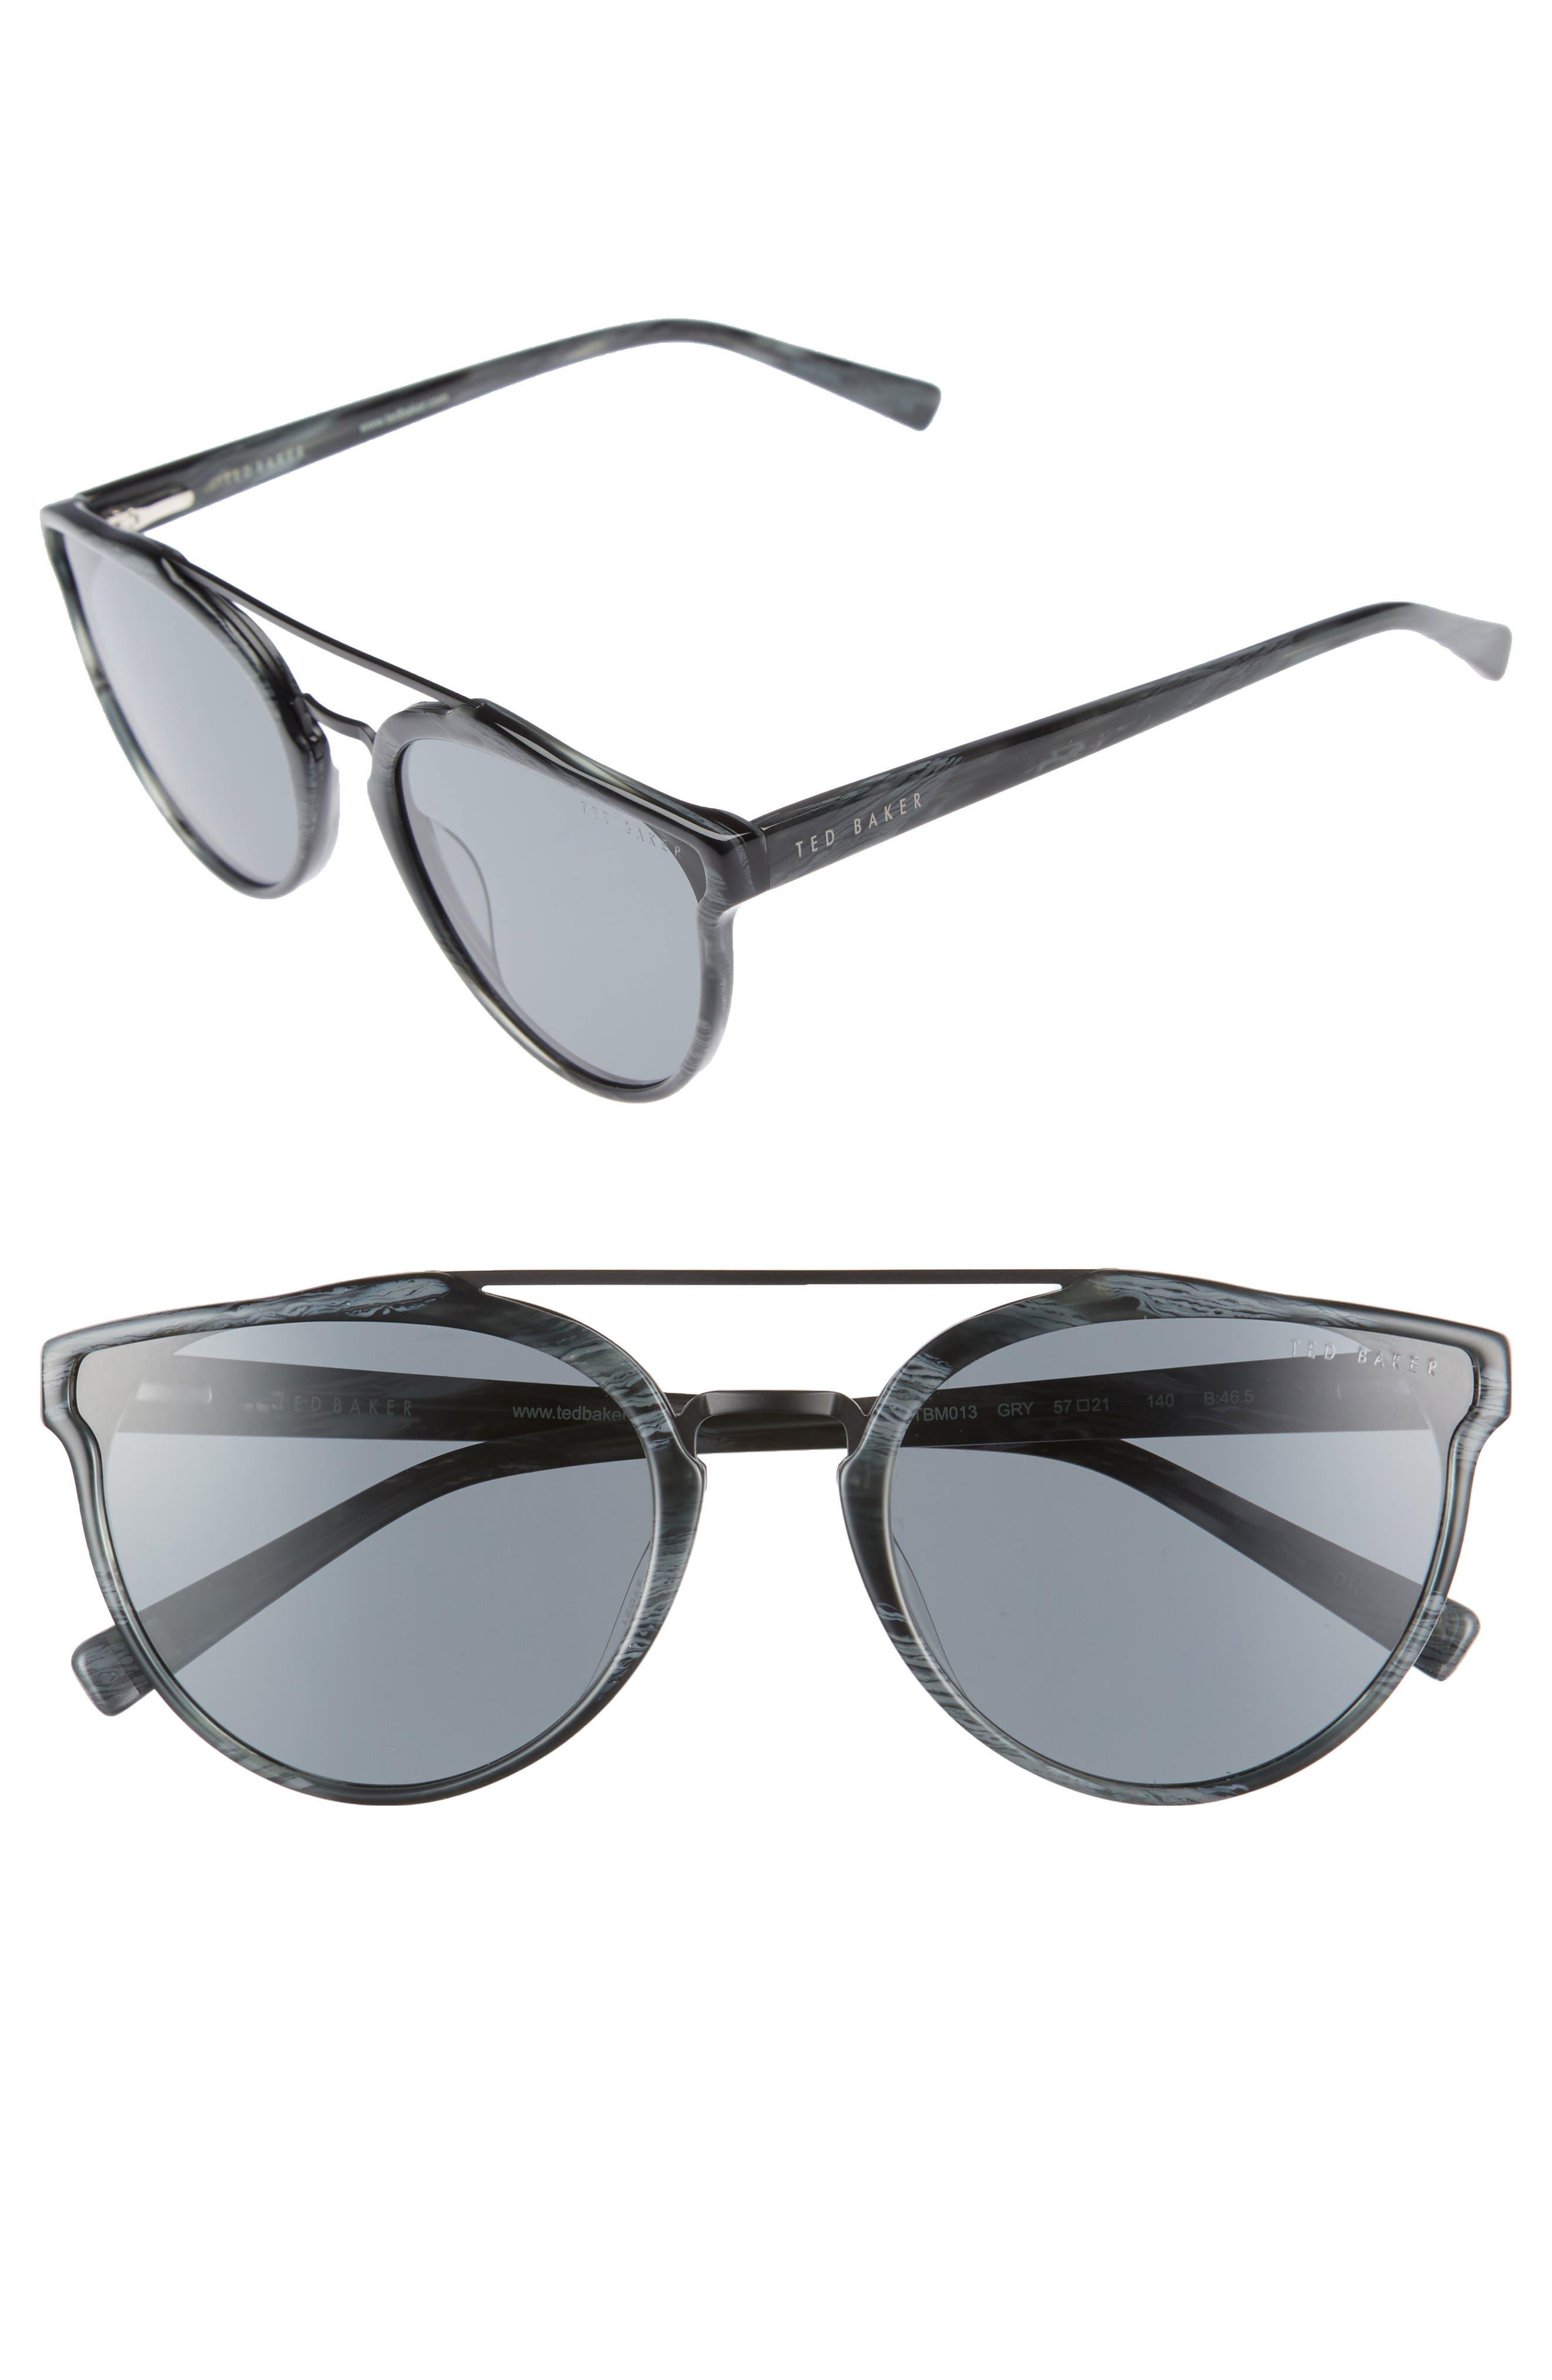 Main Image - Ted Baker London Retro 57mm Polarized Sunglasses